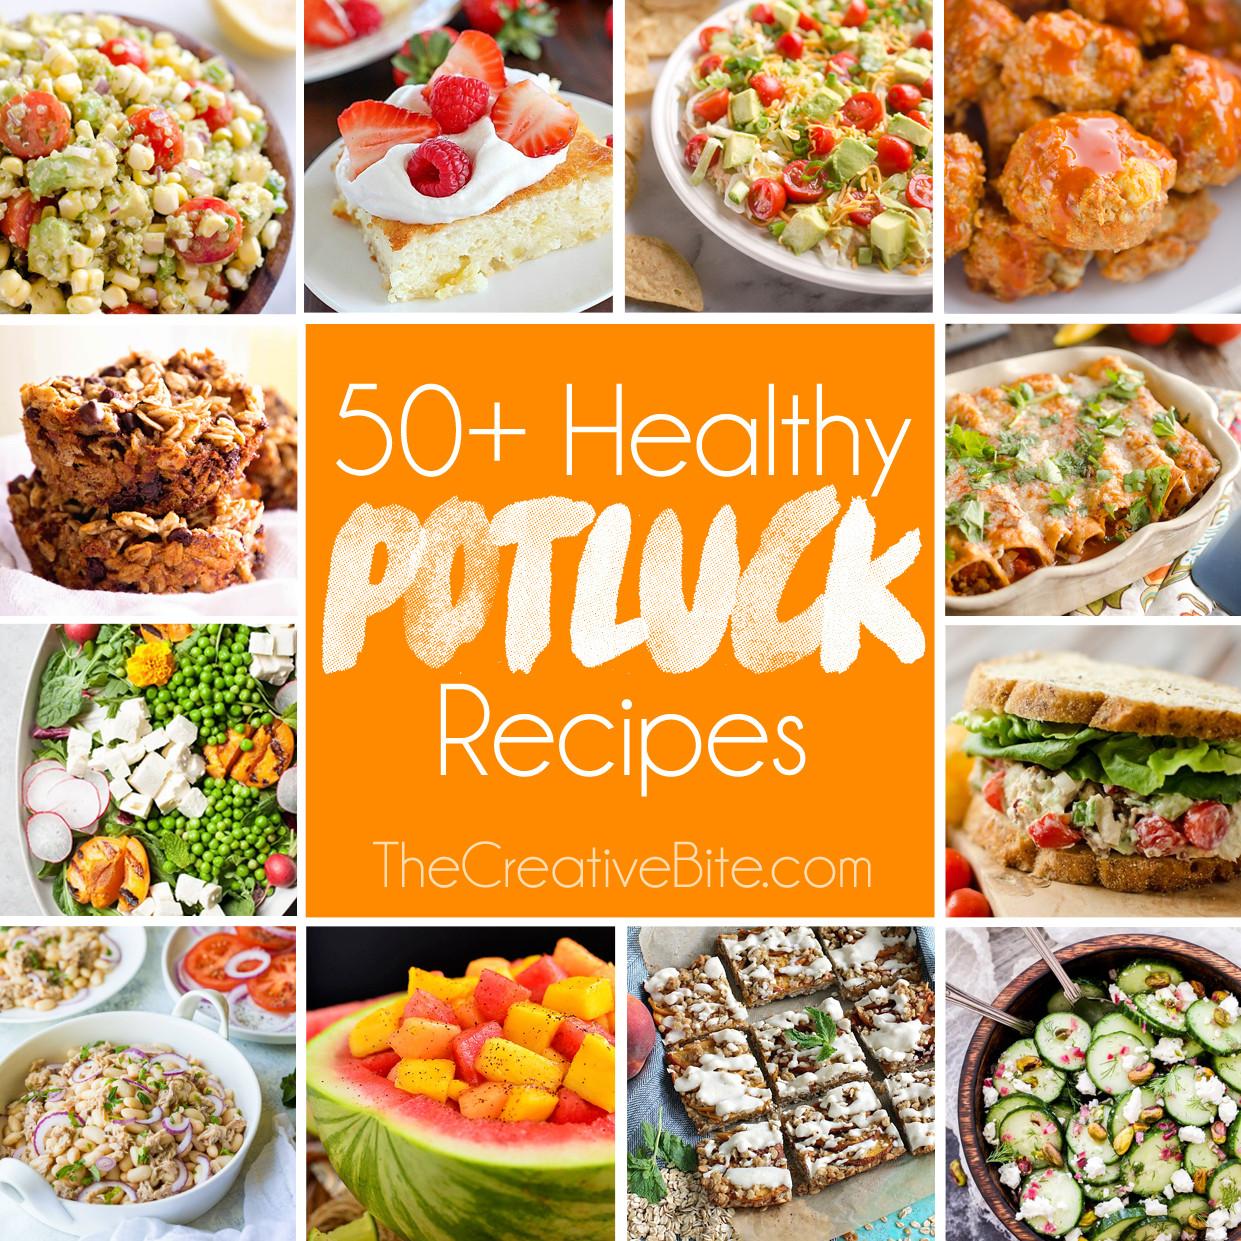 Healthy Potluck Desserts  50 Light & Healthy Potluck Recipes